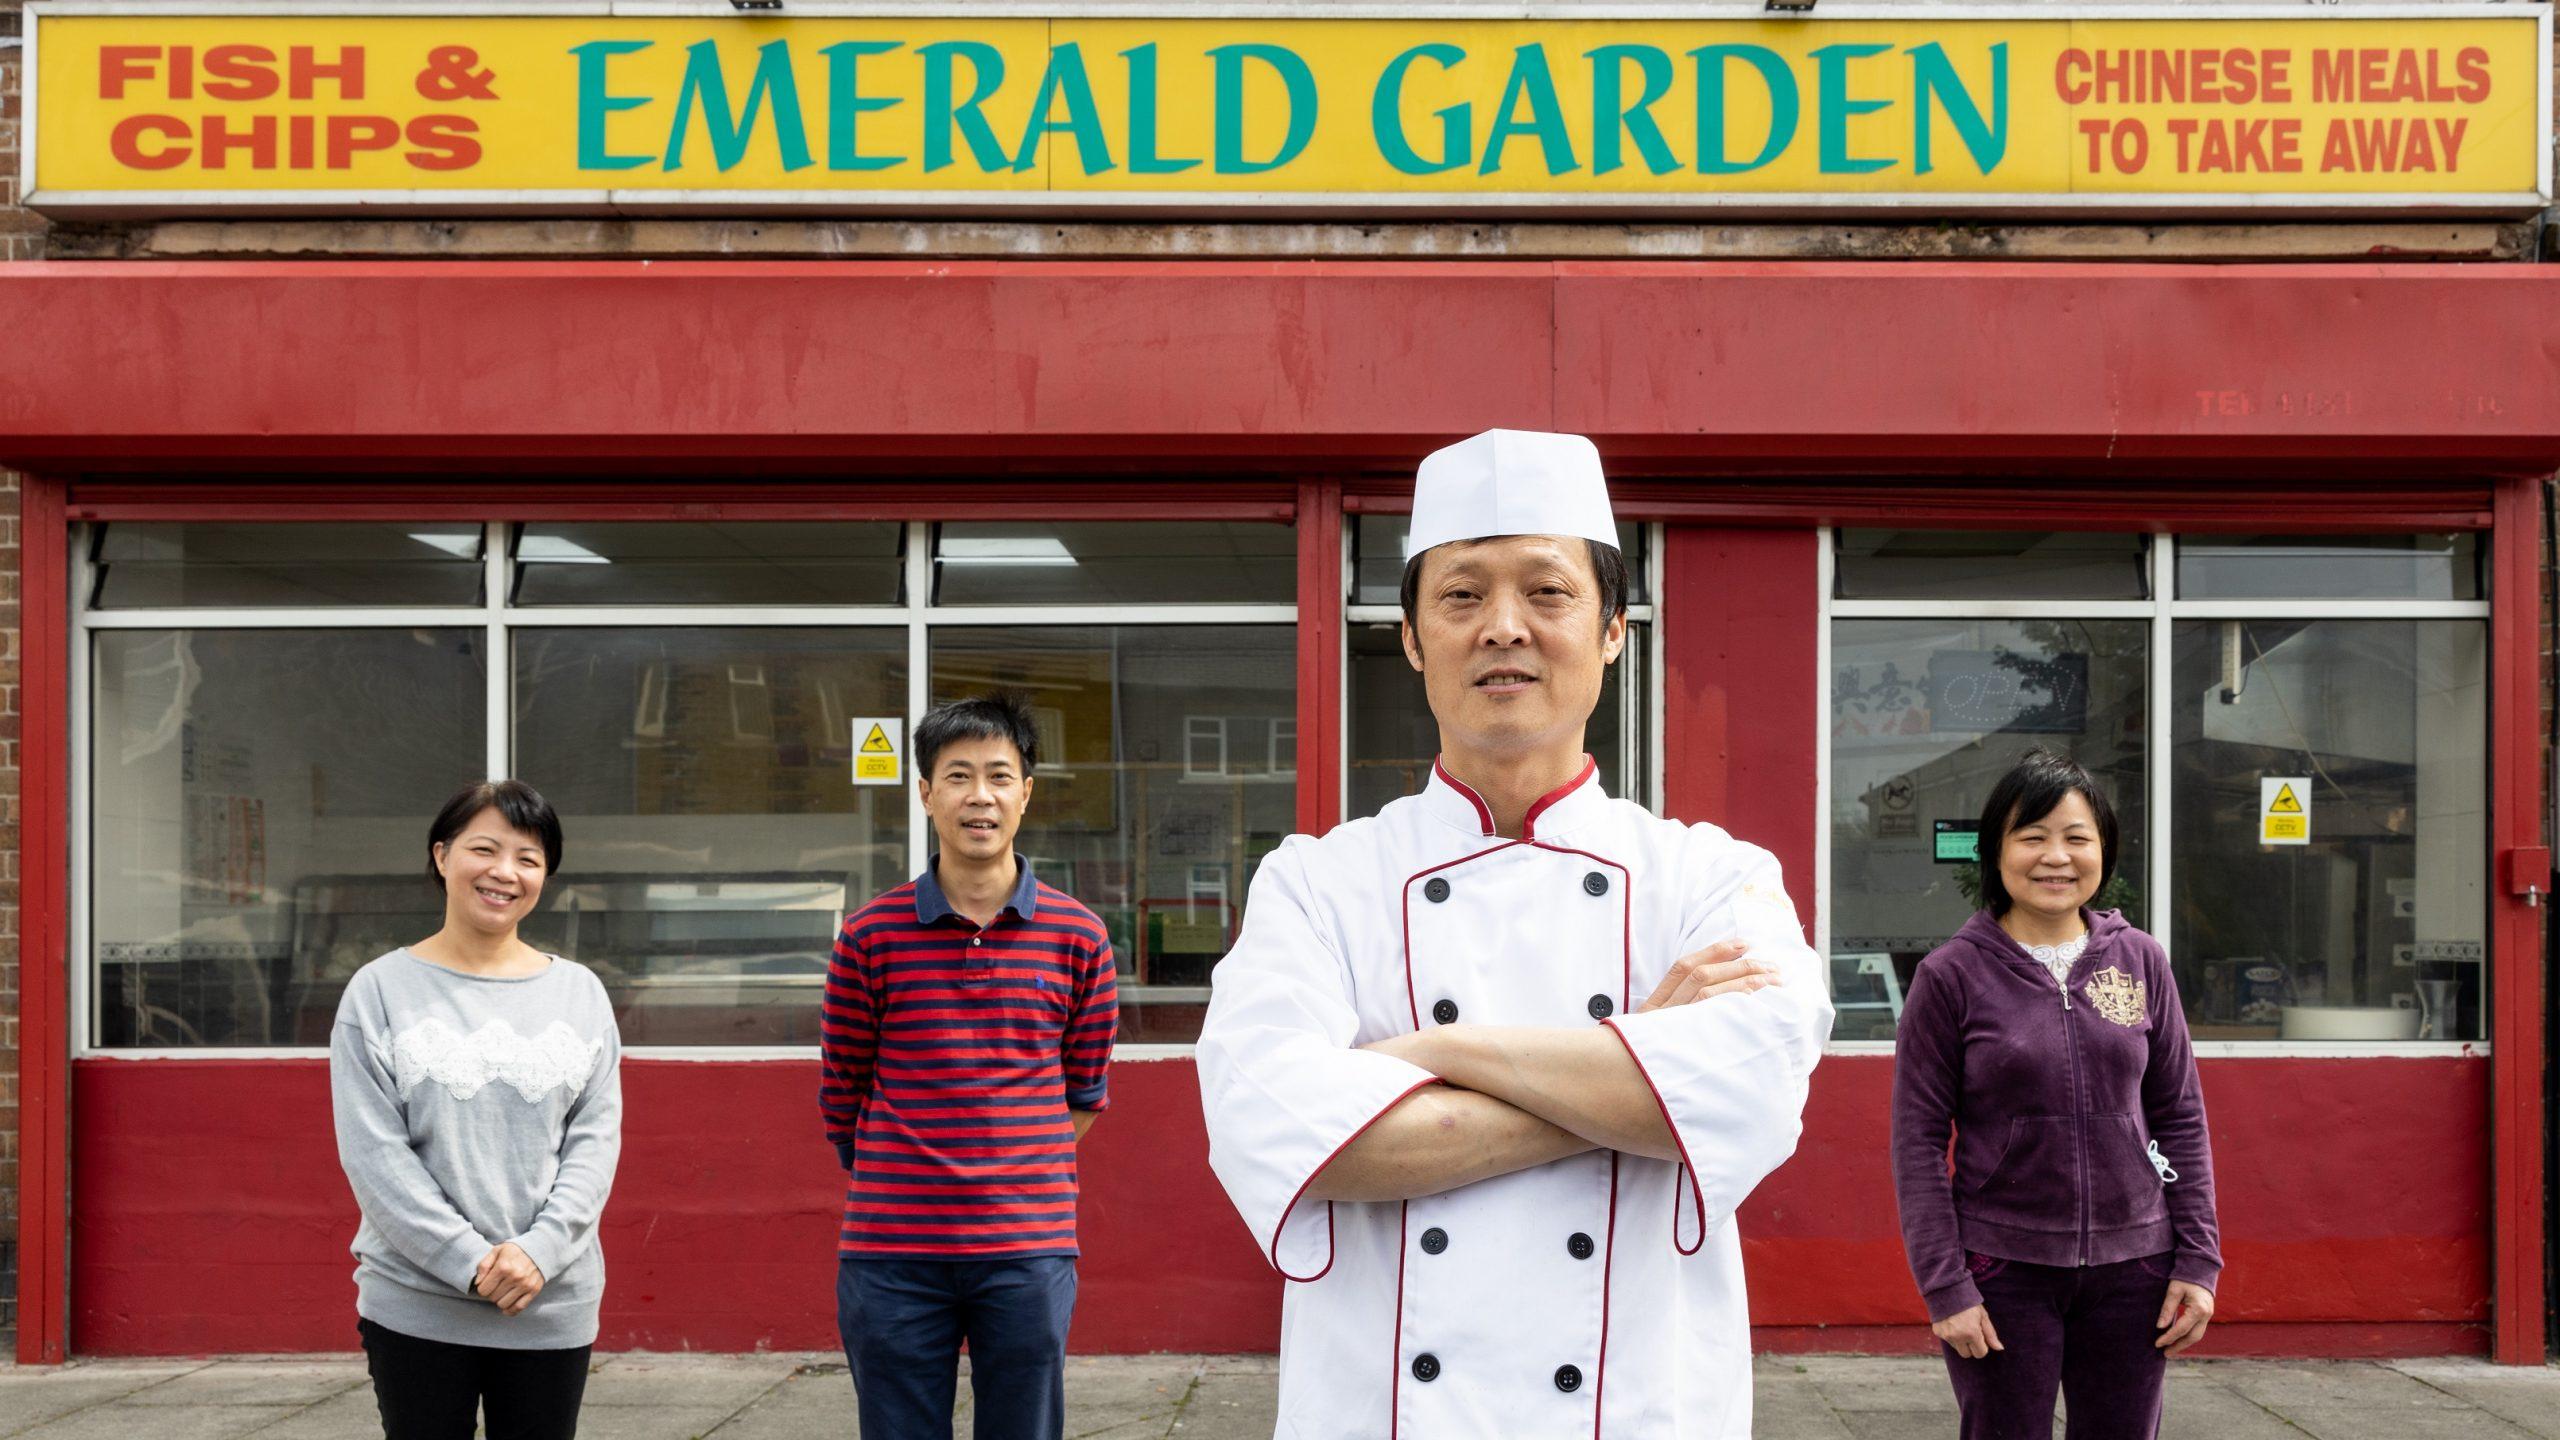 Emerald Garden 102 Moss Lane, Litherland, Liverpool L21 7NJ